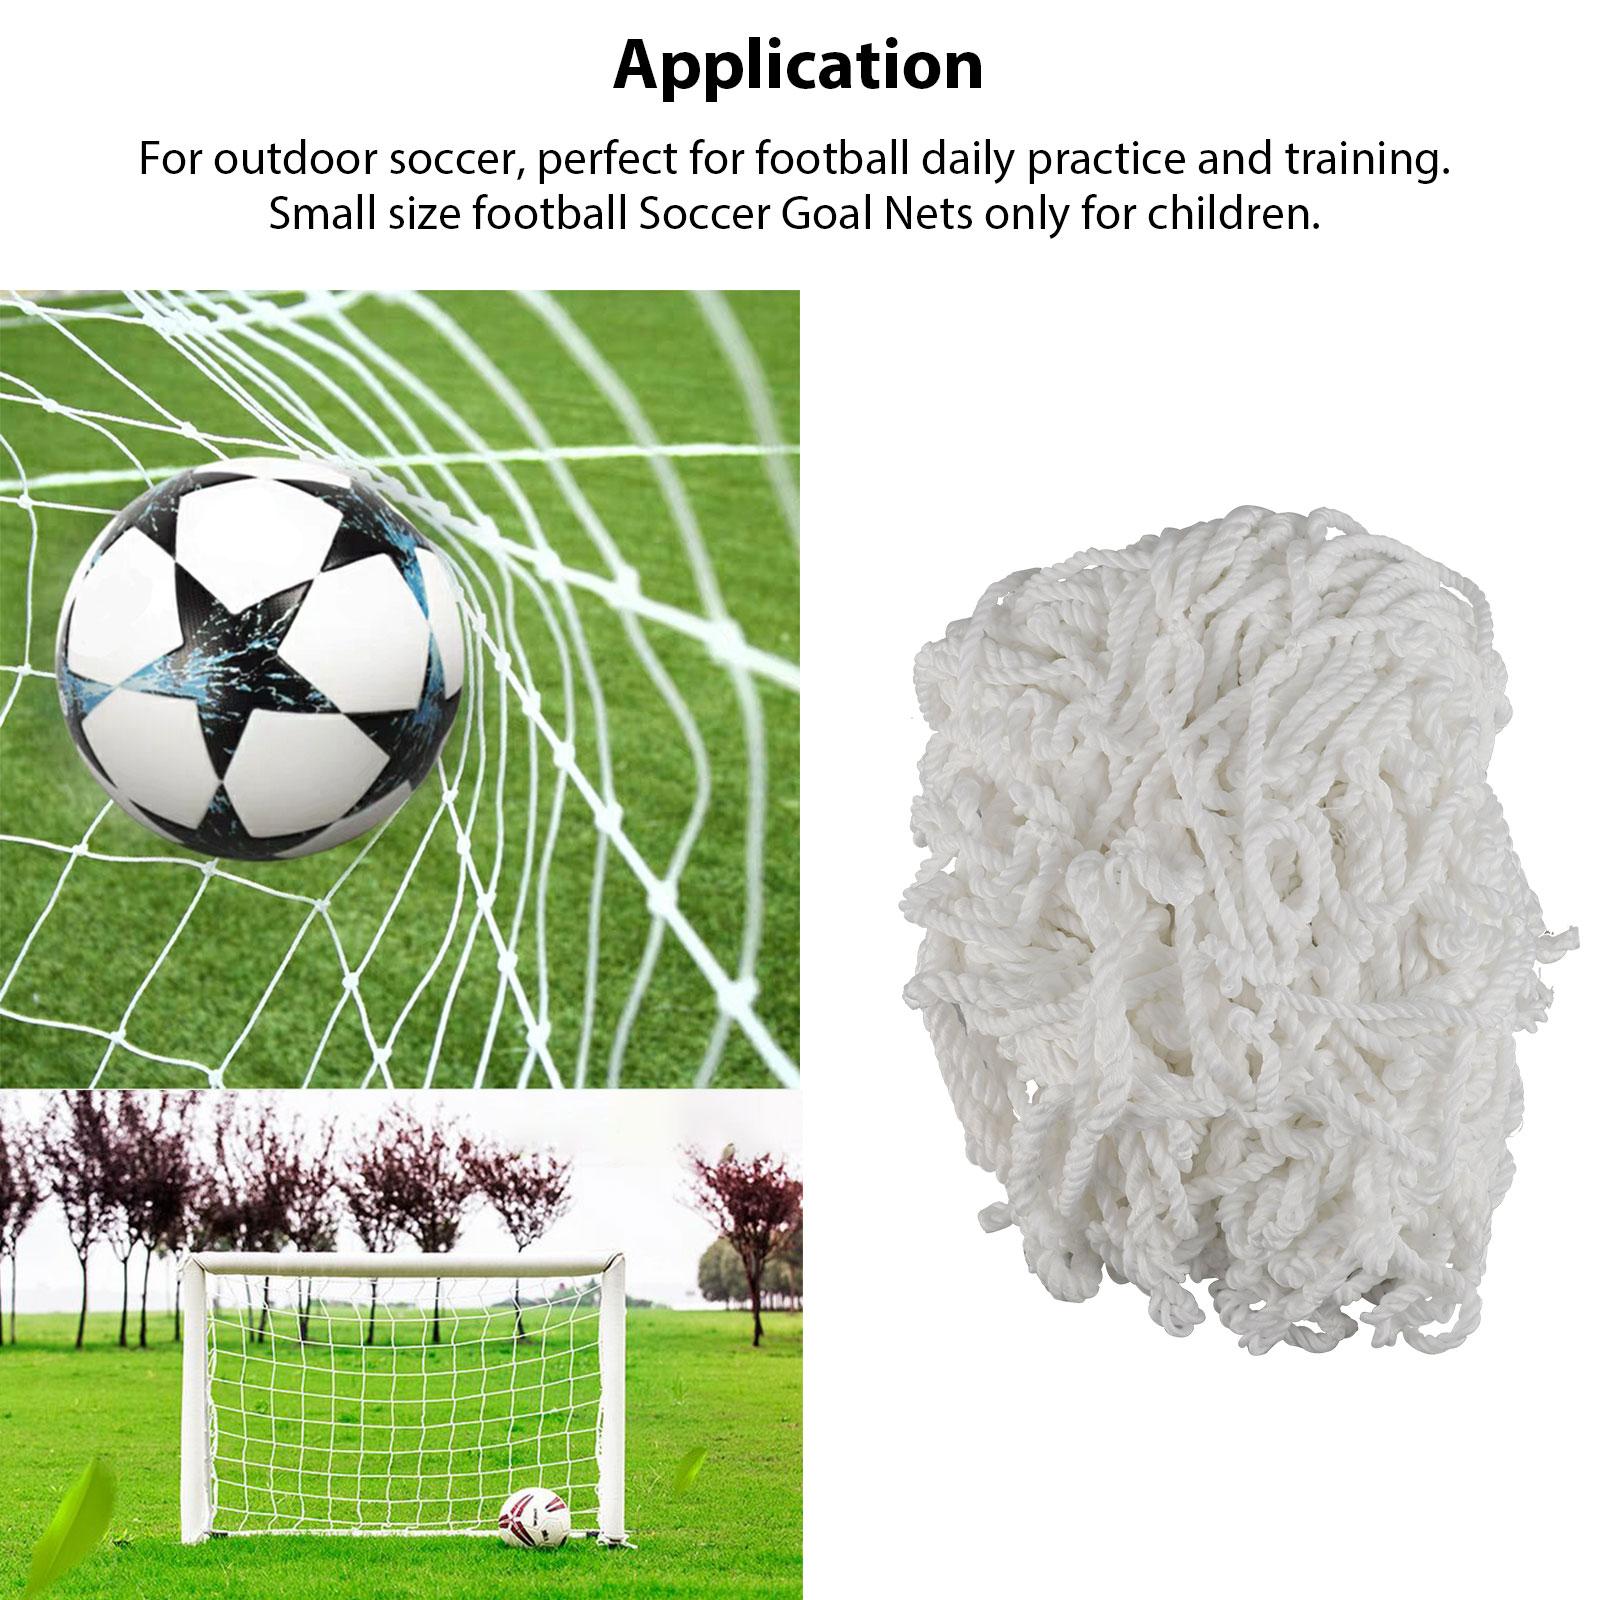 6-4ft-PE-Football-Soccer-Goal-Net-Outdoor-Backyard-Sport-Match-Training-for-Kids thumbnail 4